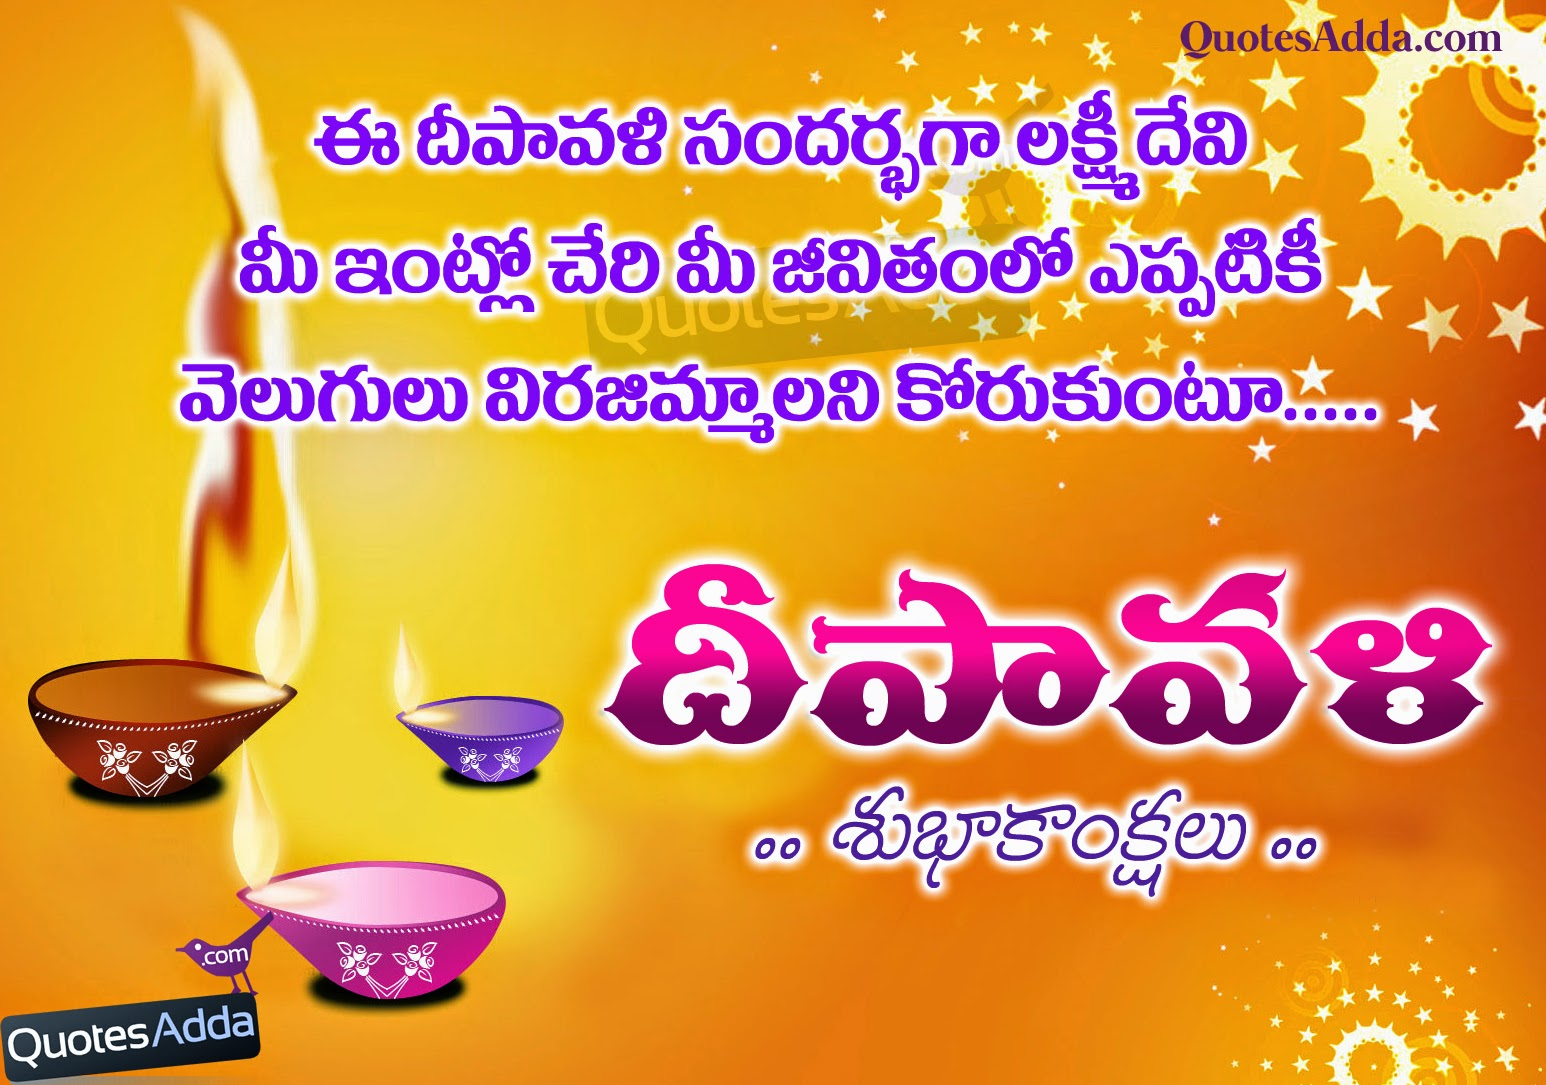 Diwali Text Messages in Telugu